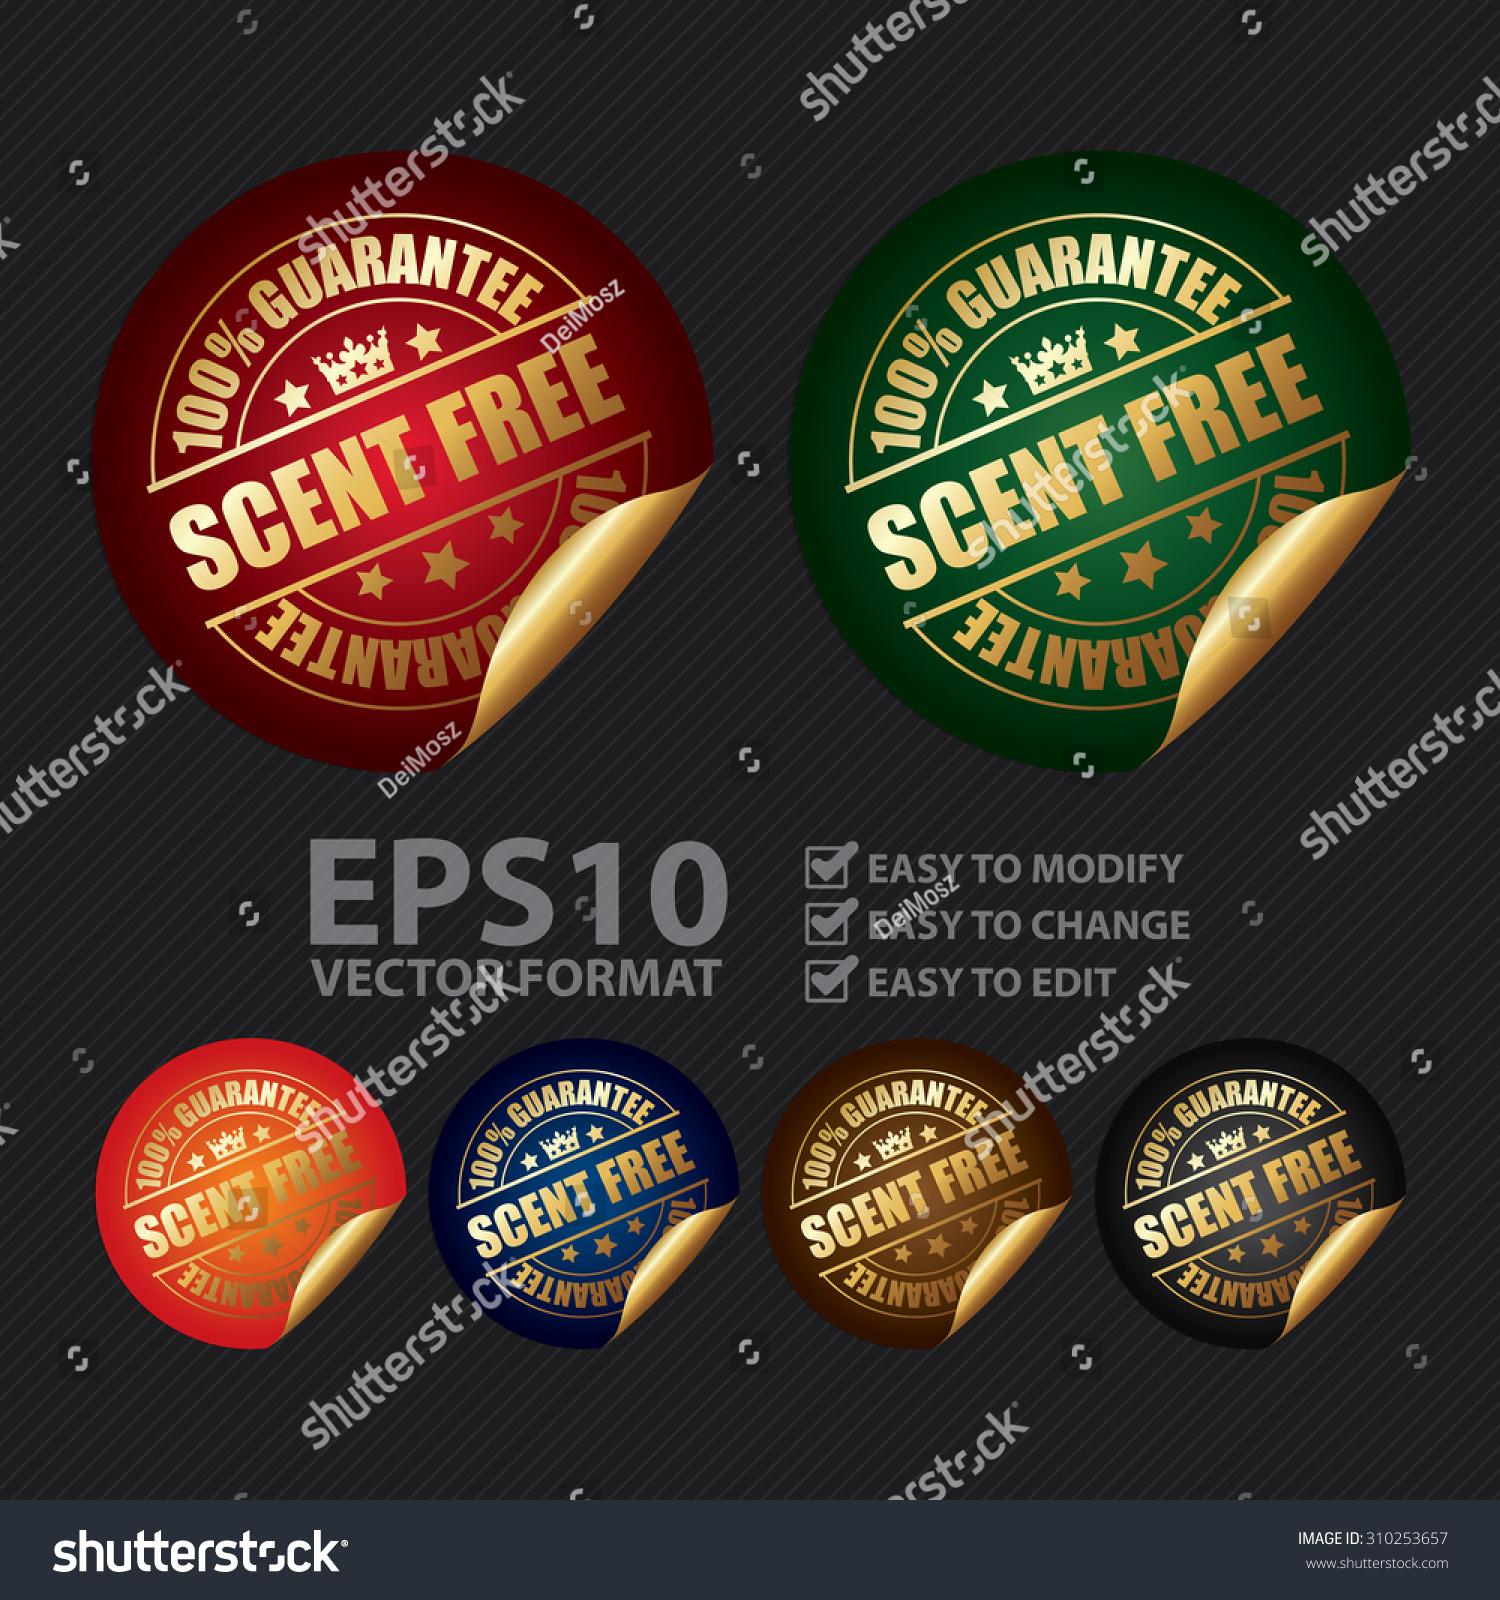 stock-vector-vector-guarantee-scent-free